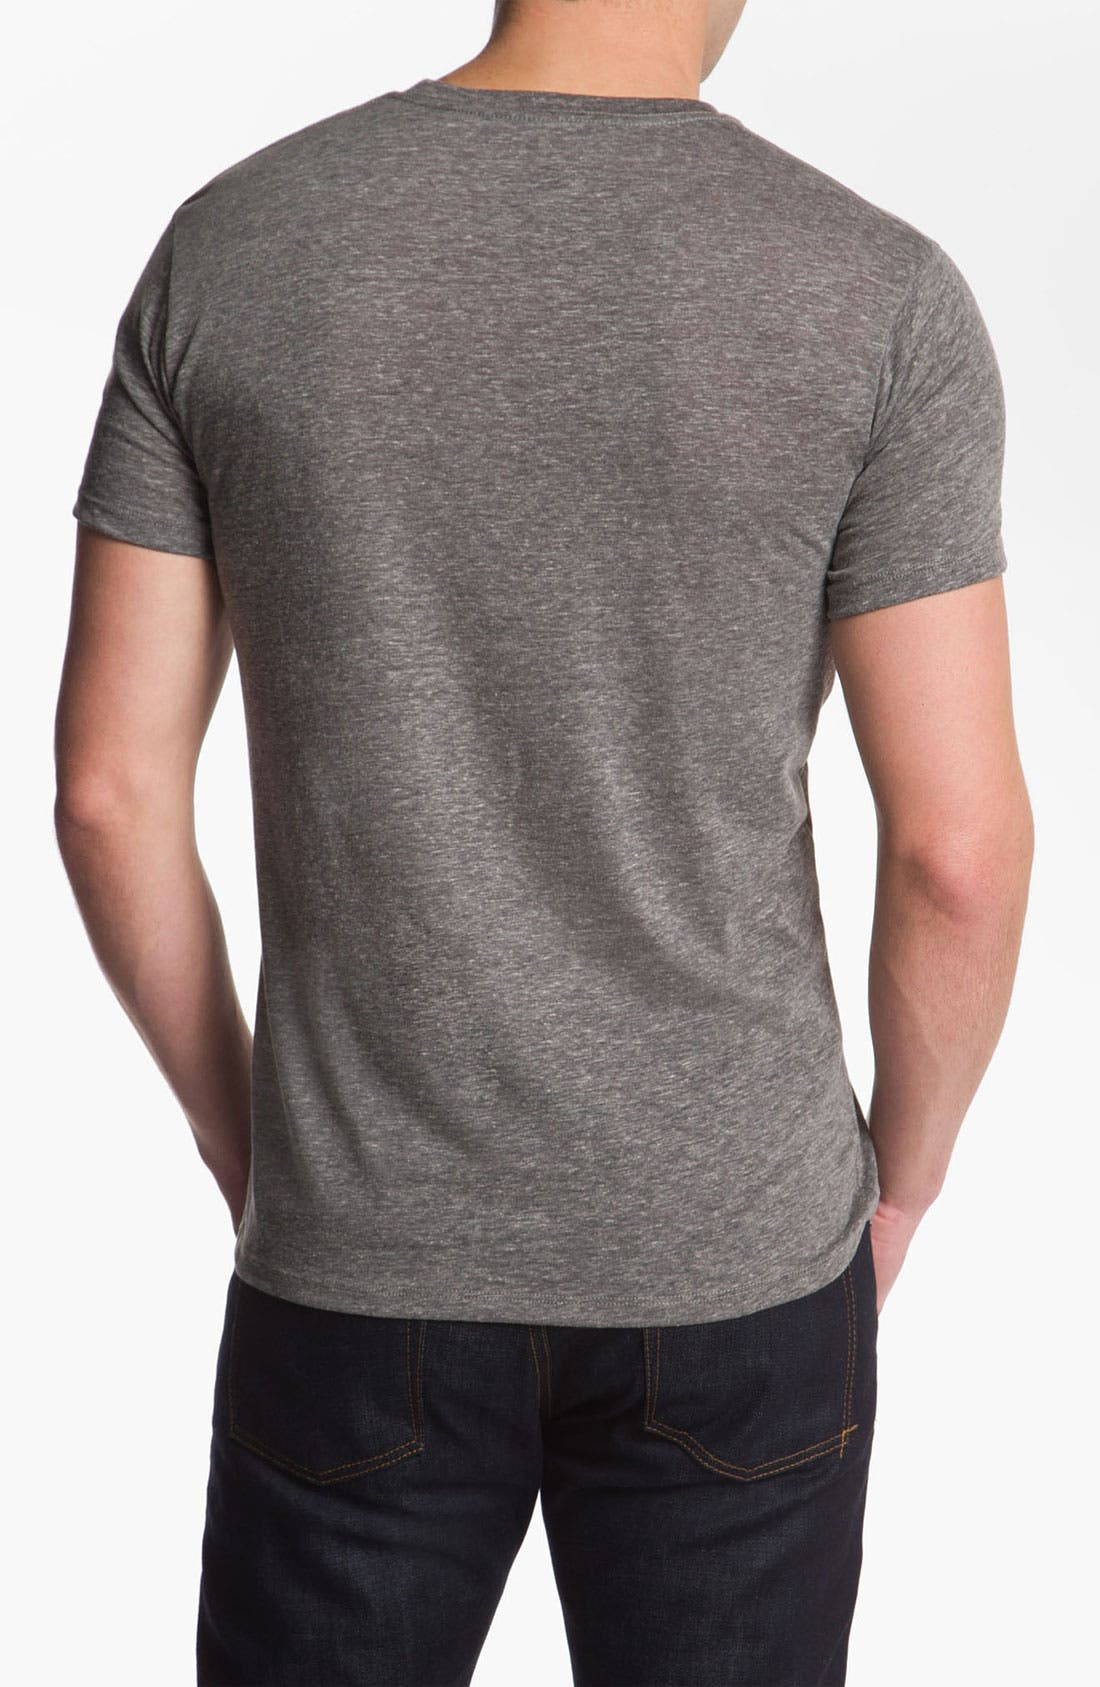 Alternate Image 2  - Headline Shirts 'Jack' Graphic T-Shirt